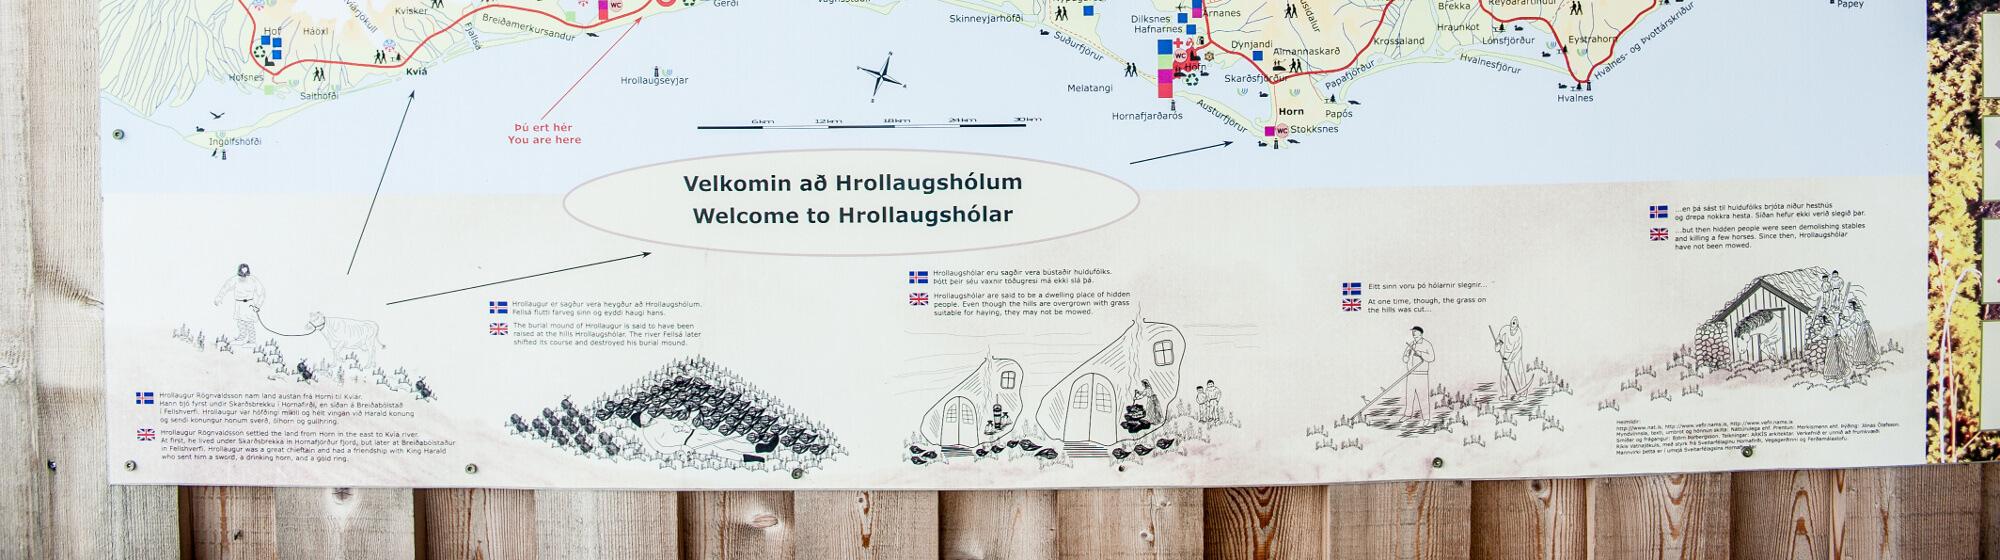 islandia-ukryci-ludzie-legenda